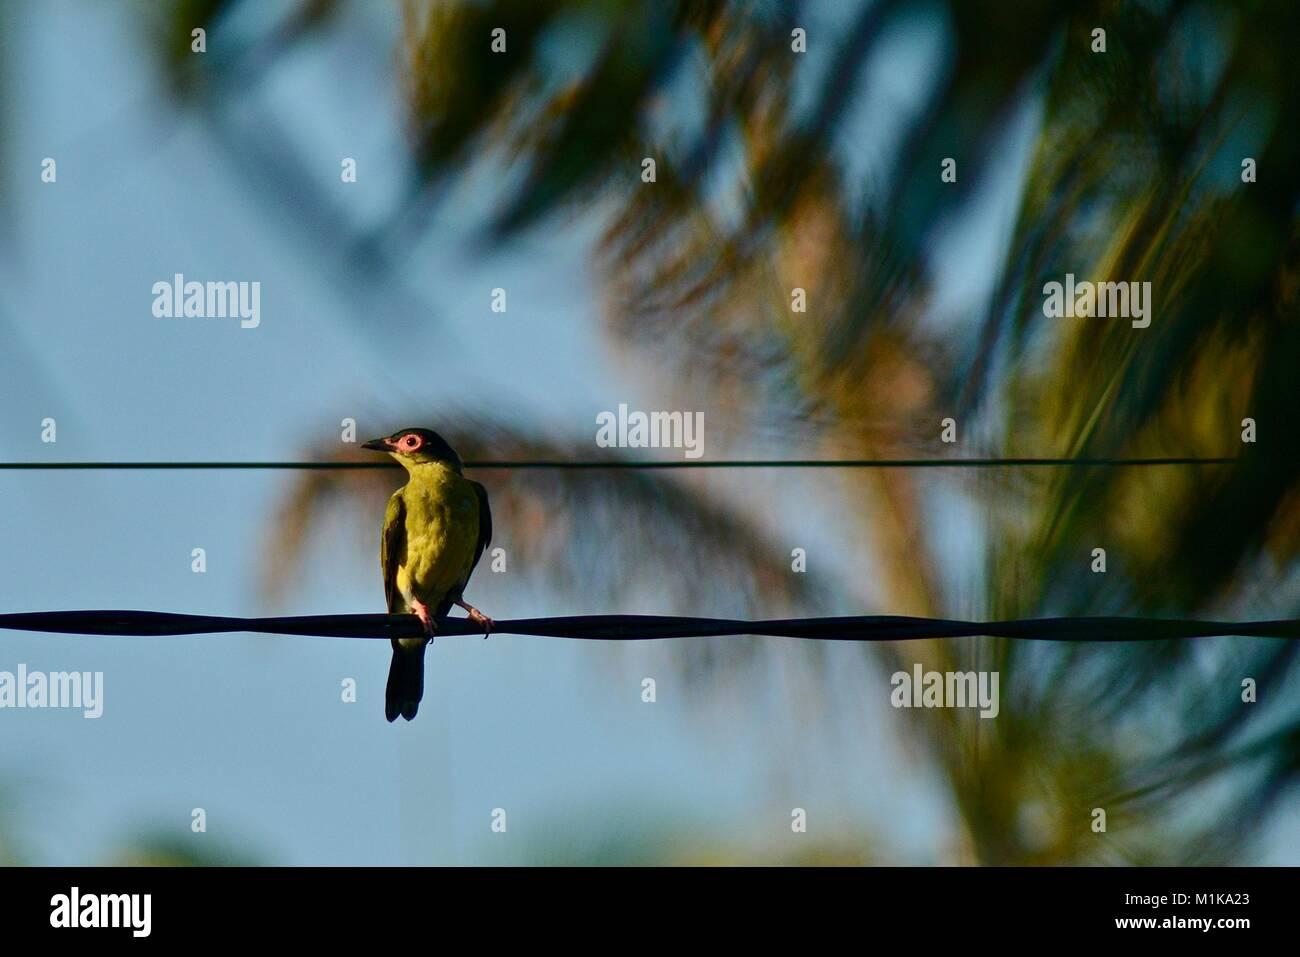 Male Australasian figbird (Sphecotheres vieilloti), Townsville, Queensland, Australia Stock Photo